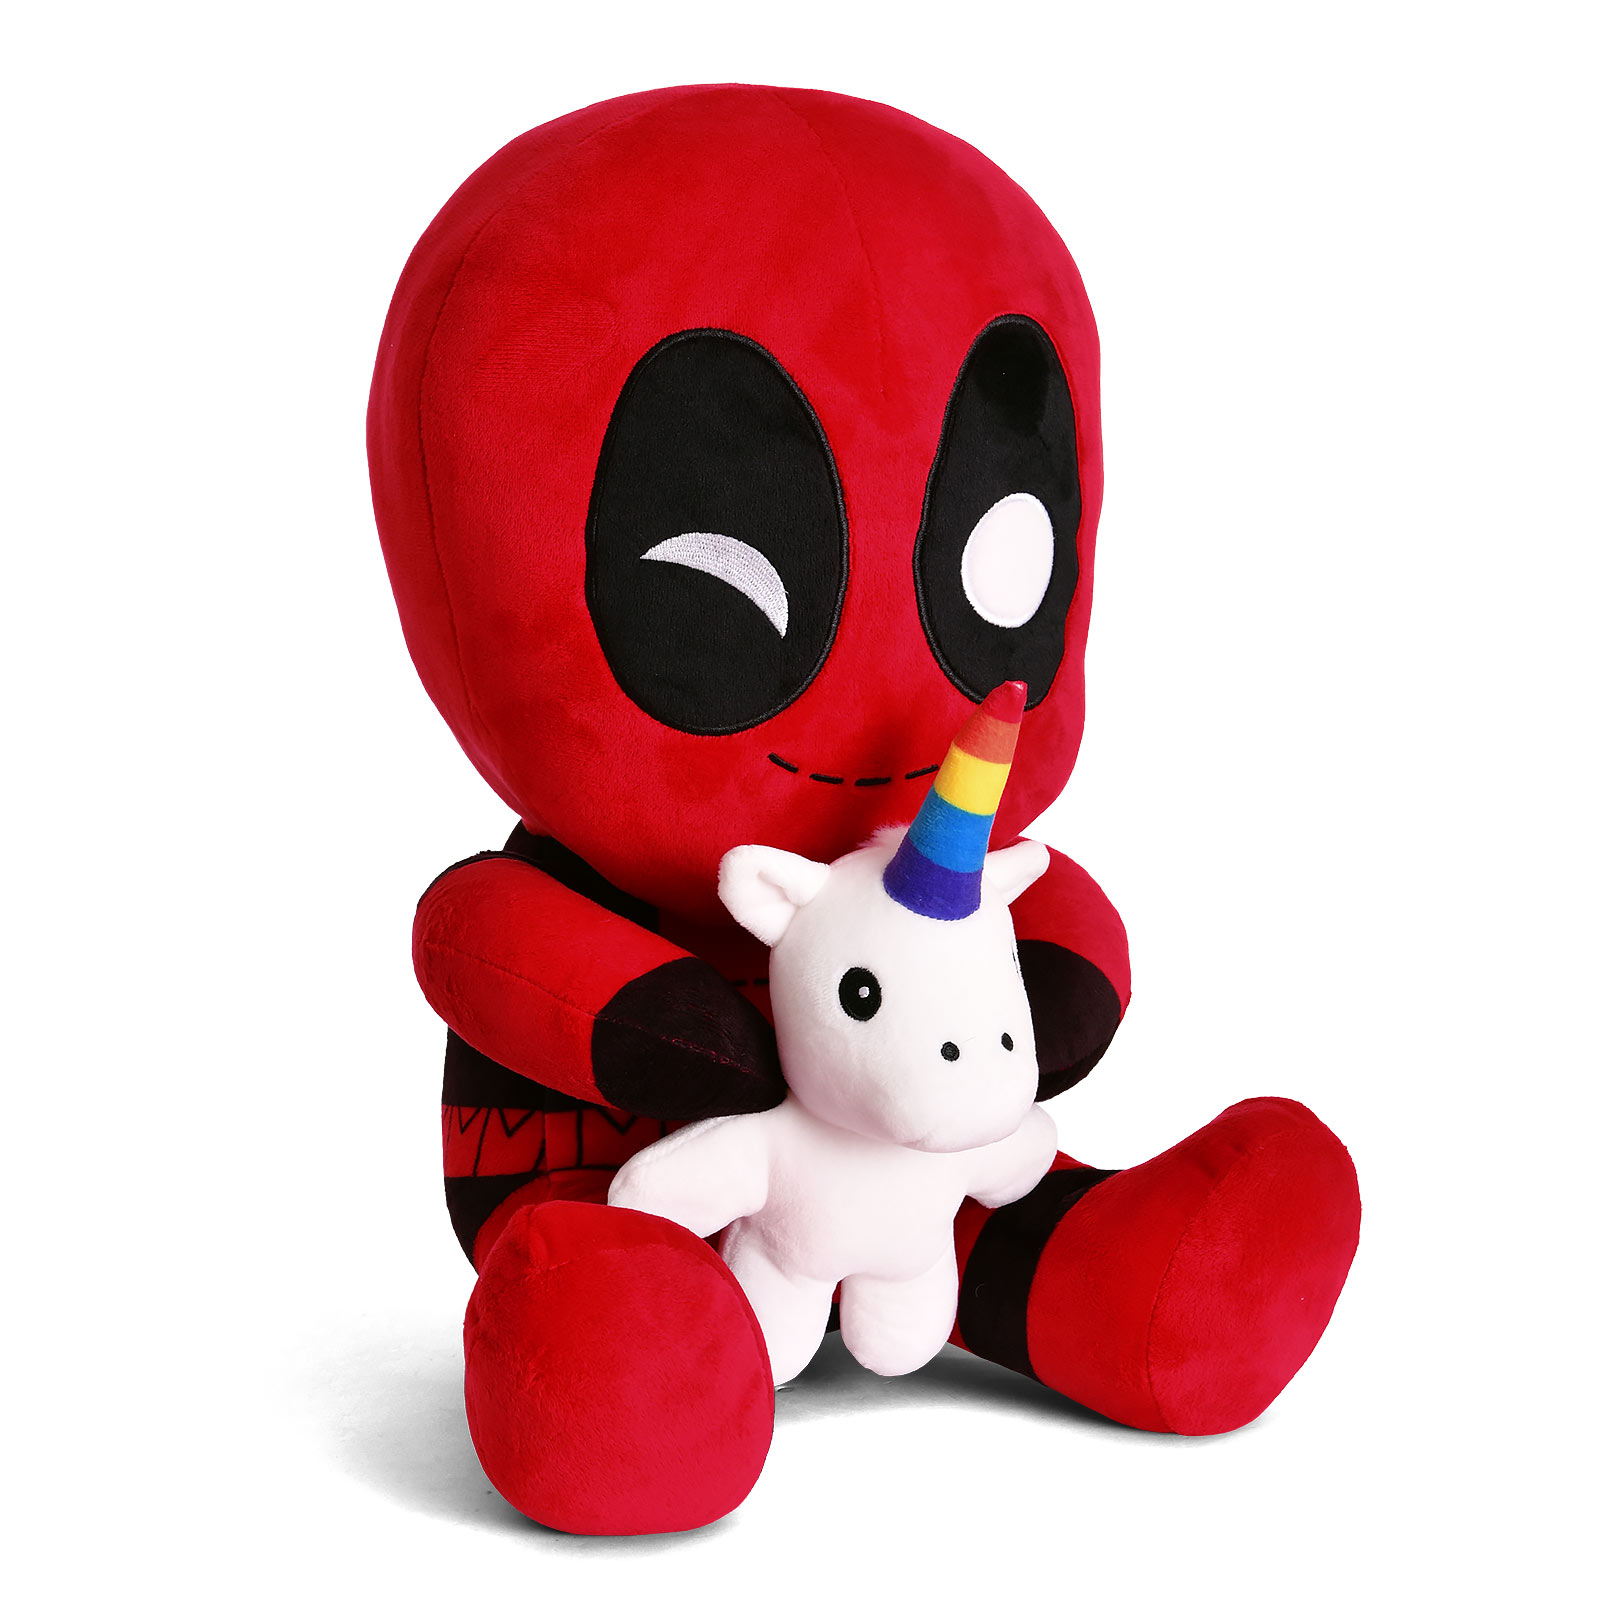 Deadpool - Unicorn HugMe Plüsch Figur mit Vibration 36cm